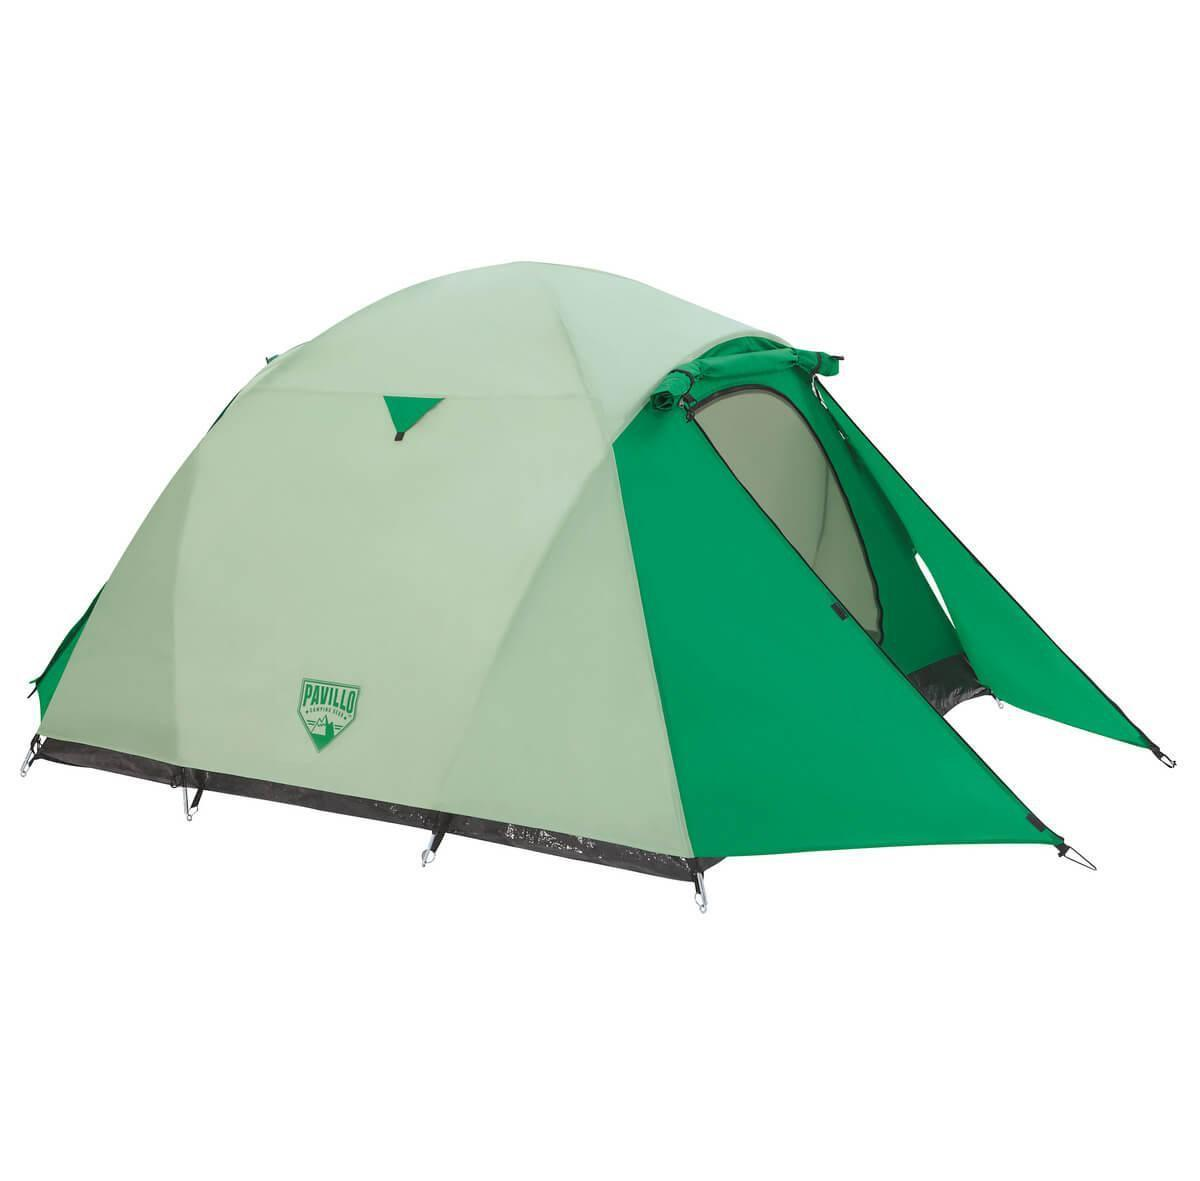 Трехместная палатка Bestway Cultiva 68046 Салатовый (008968)